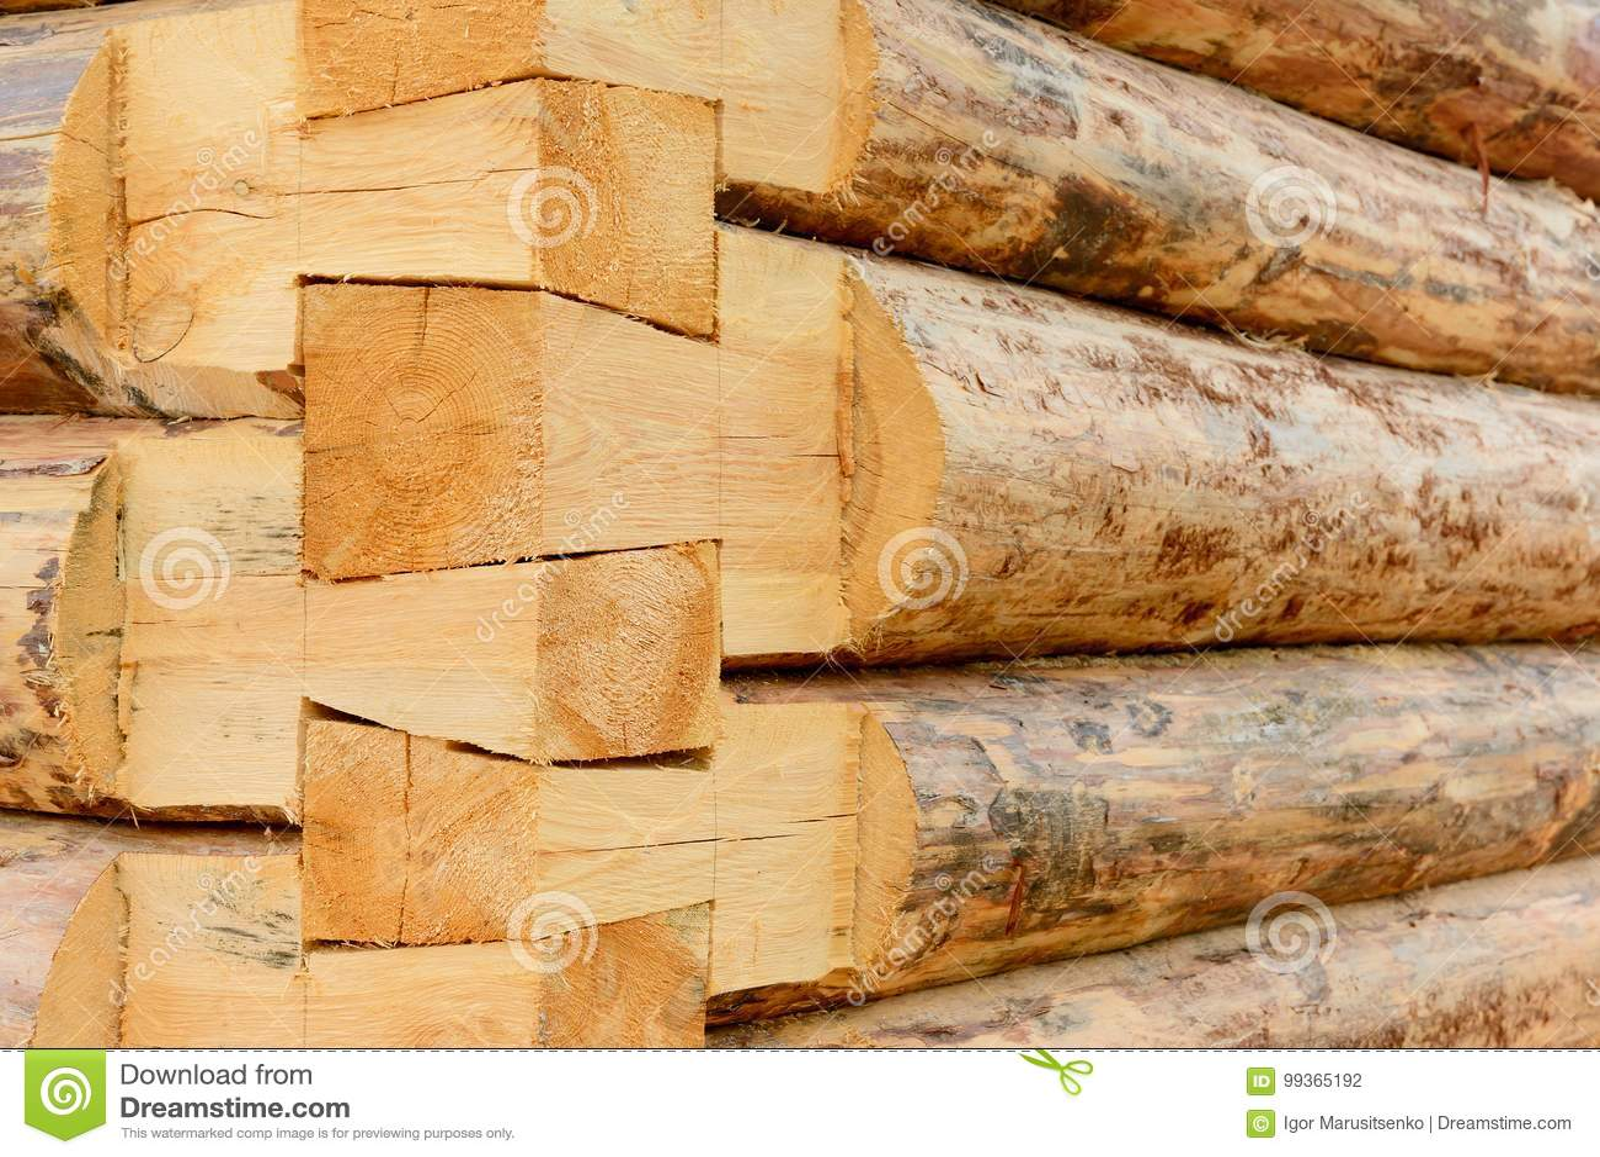 2f7d0a26bd0b Κατασκευή ενός ξύλινου σπιτιού φιαγμένου από κούτσουρα Μέρος ενός πλαισίου  της αγροτικών γωνίας και του τοίχου σπιτιών